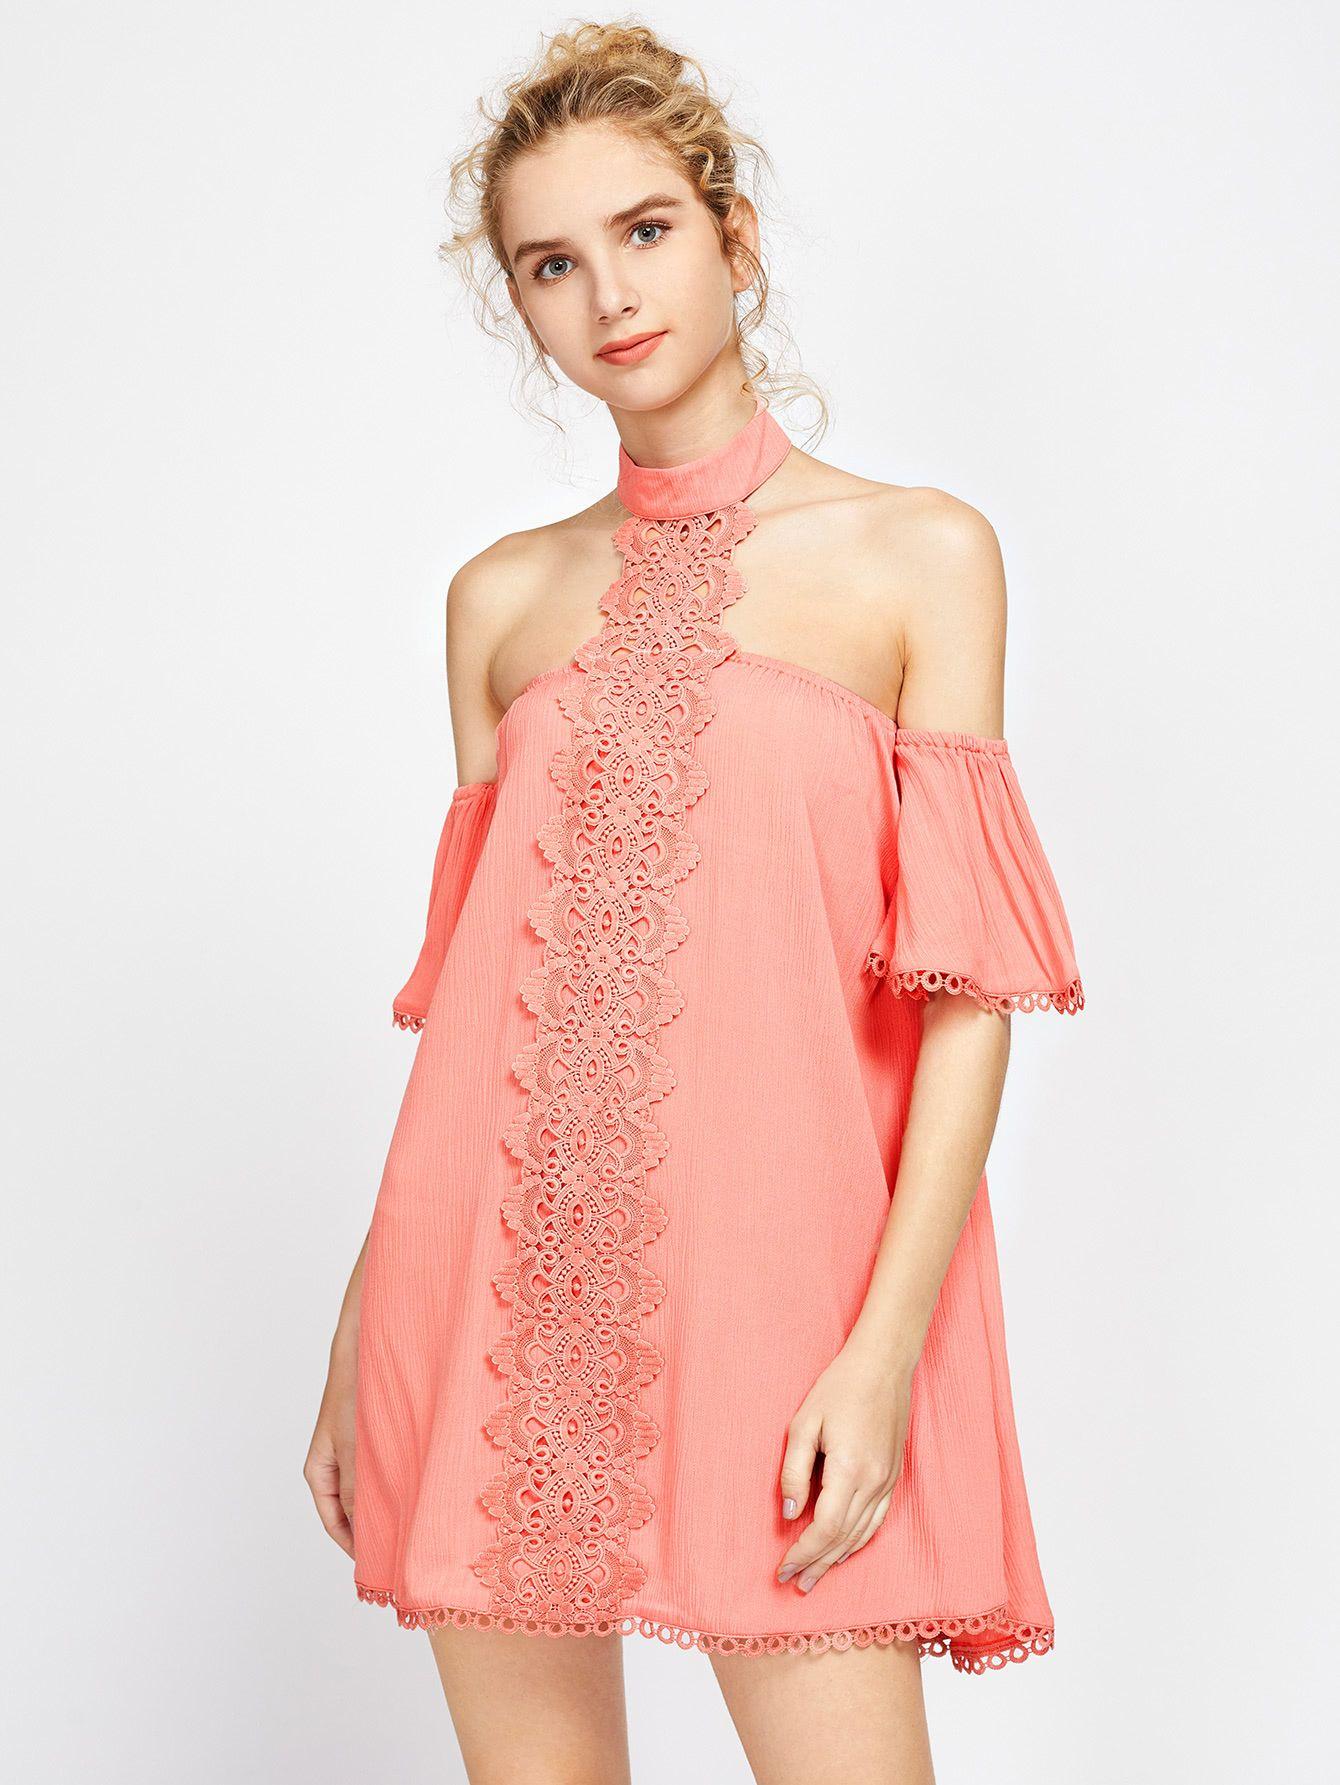 cd1ffe60de Off Shoulder Lace Trim Halter Neck Dress -SheIn(Sheinside) | Fashion ...